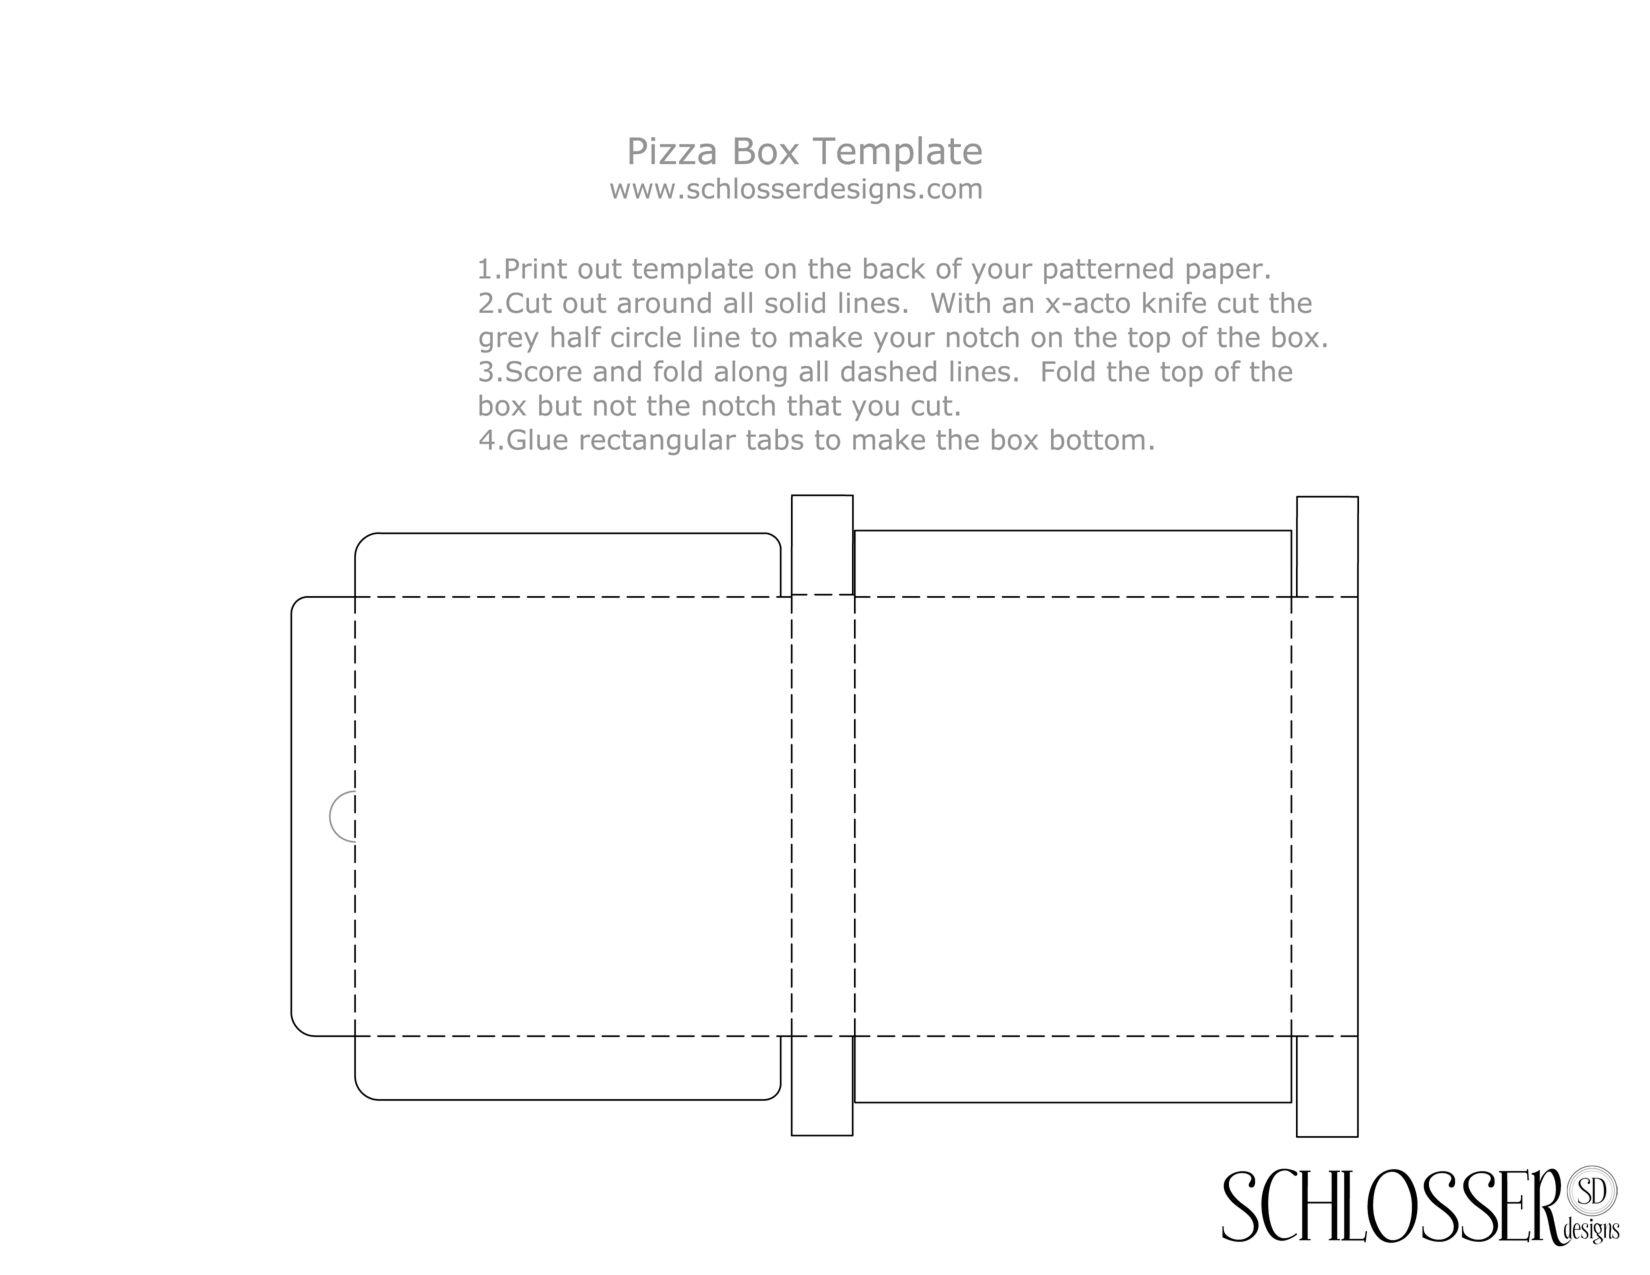 The Glamorous Free Cardboard Box Templates Pizza Box Template Pizza Regarding Card Box Template Generator Images B Box Template Paper Box Template Card Box